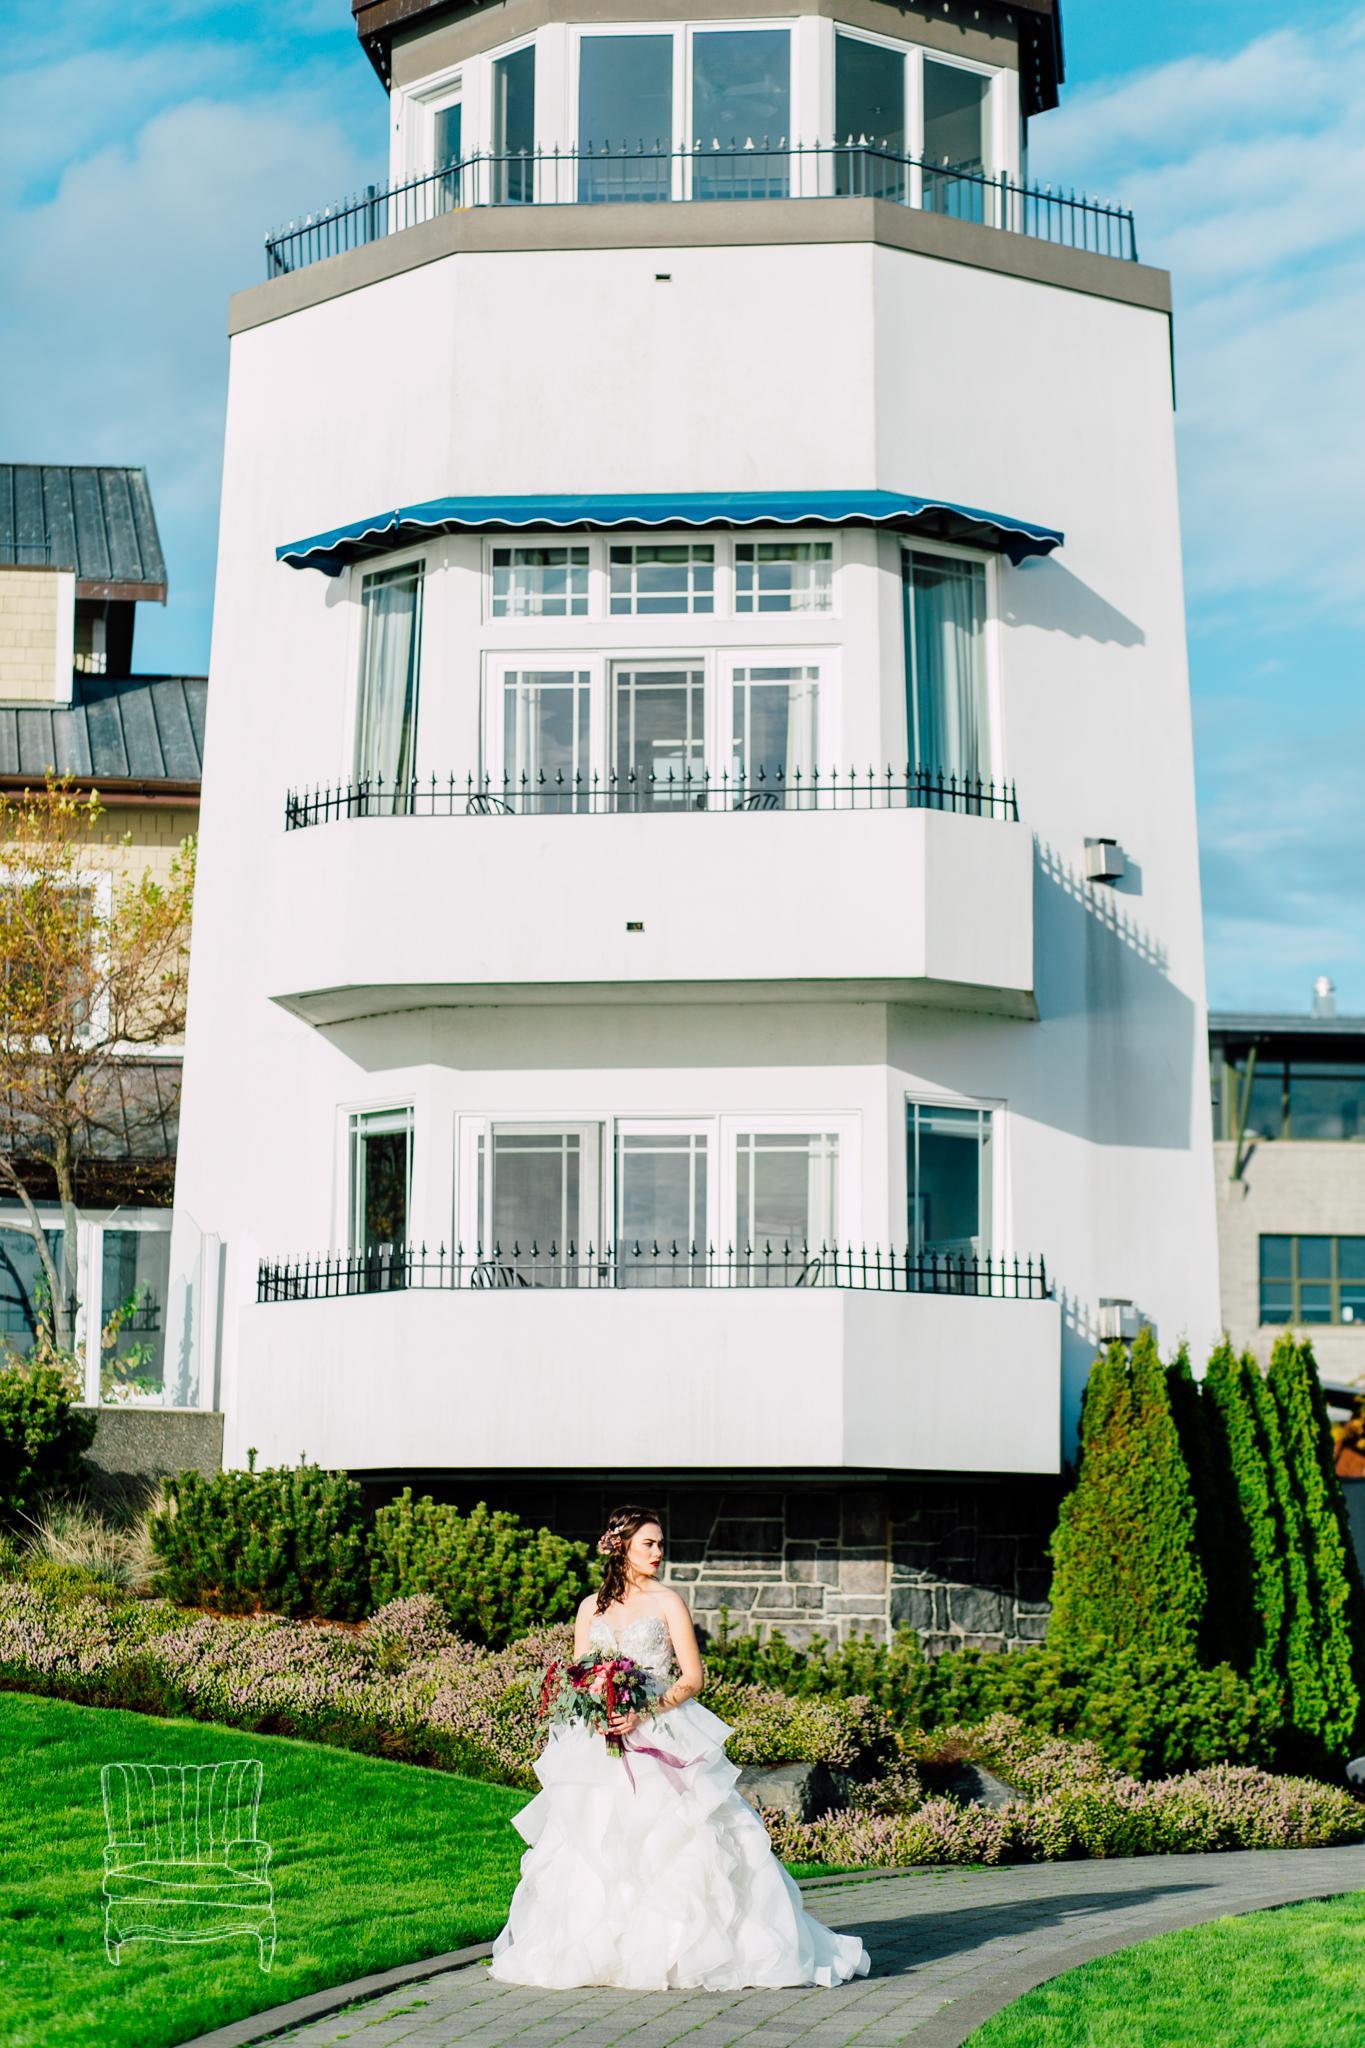 bellwether-hotel-bellingham-wedding-photographer-katheryn-moran-glitz-glam-styled-395.jpg